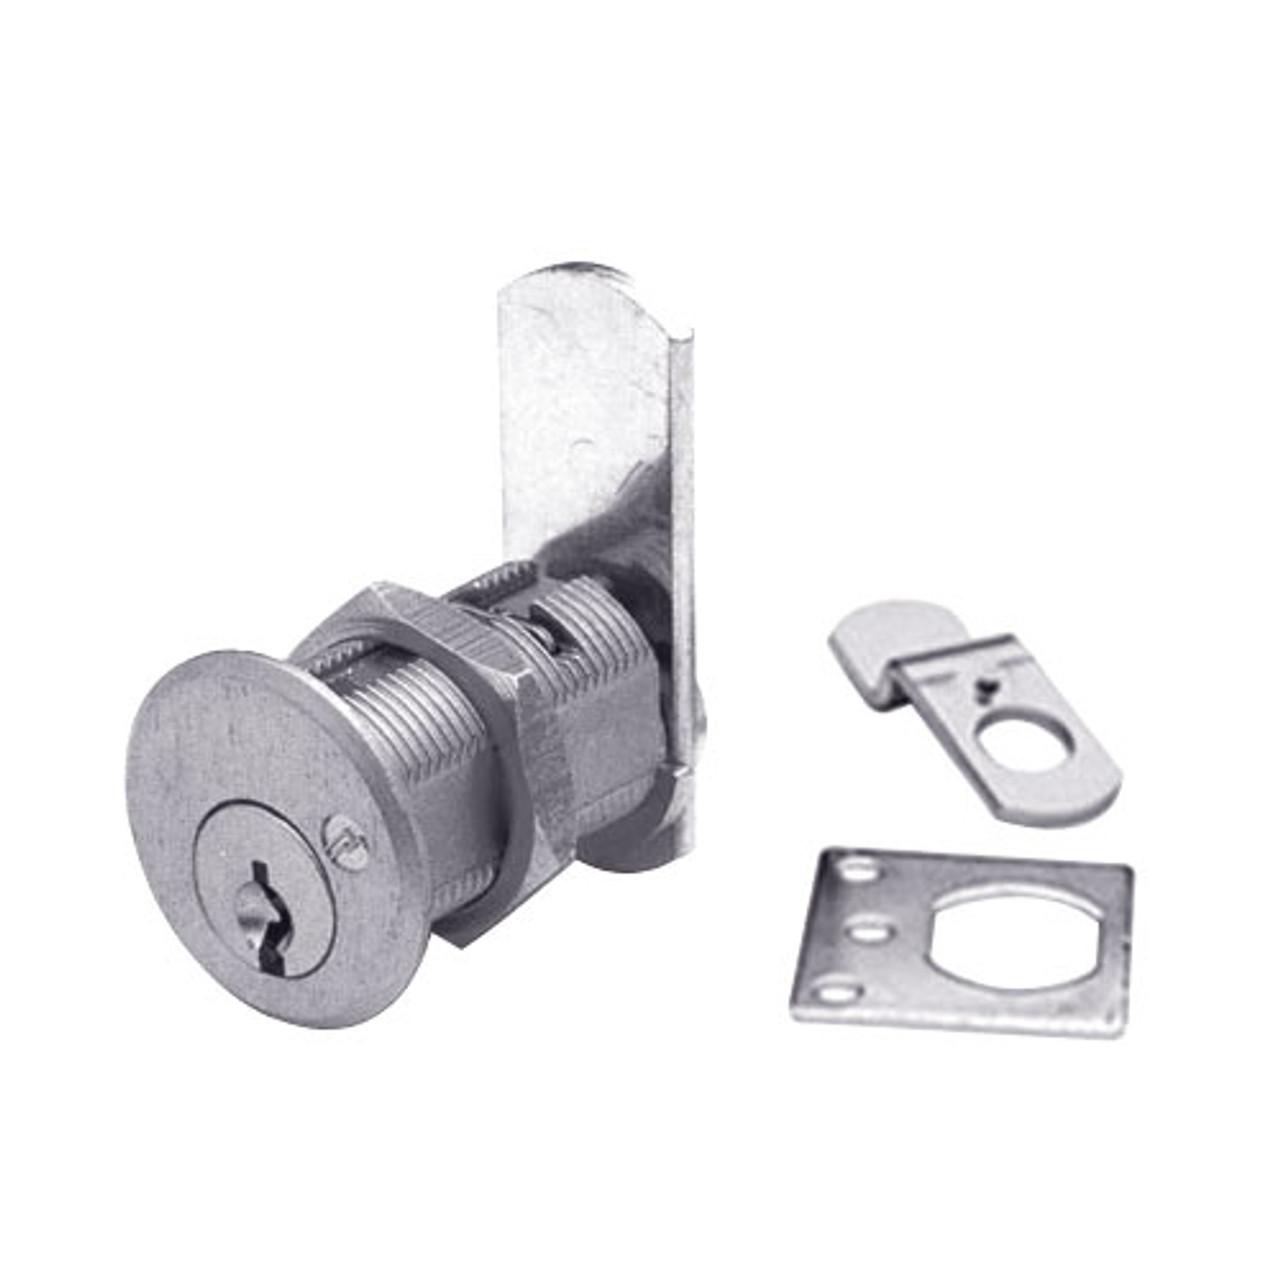 Olympus DCR4-KD-26D Cam Locks in Satin Chrome Finish